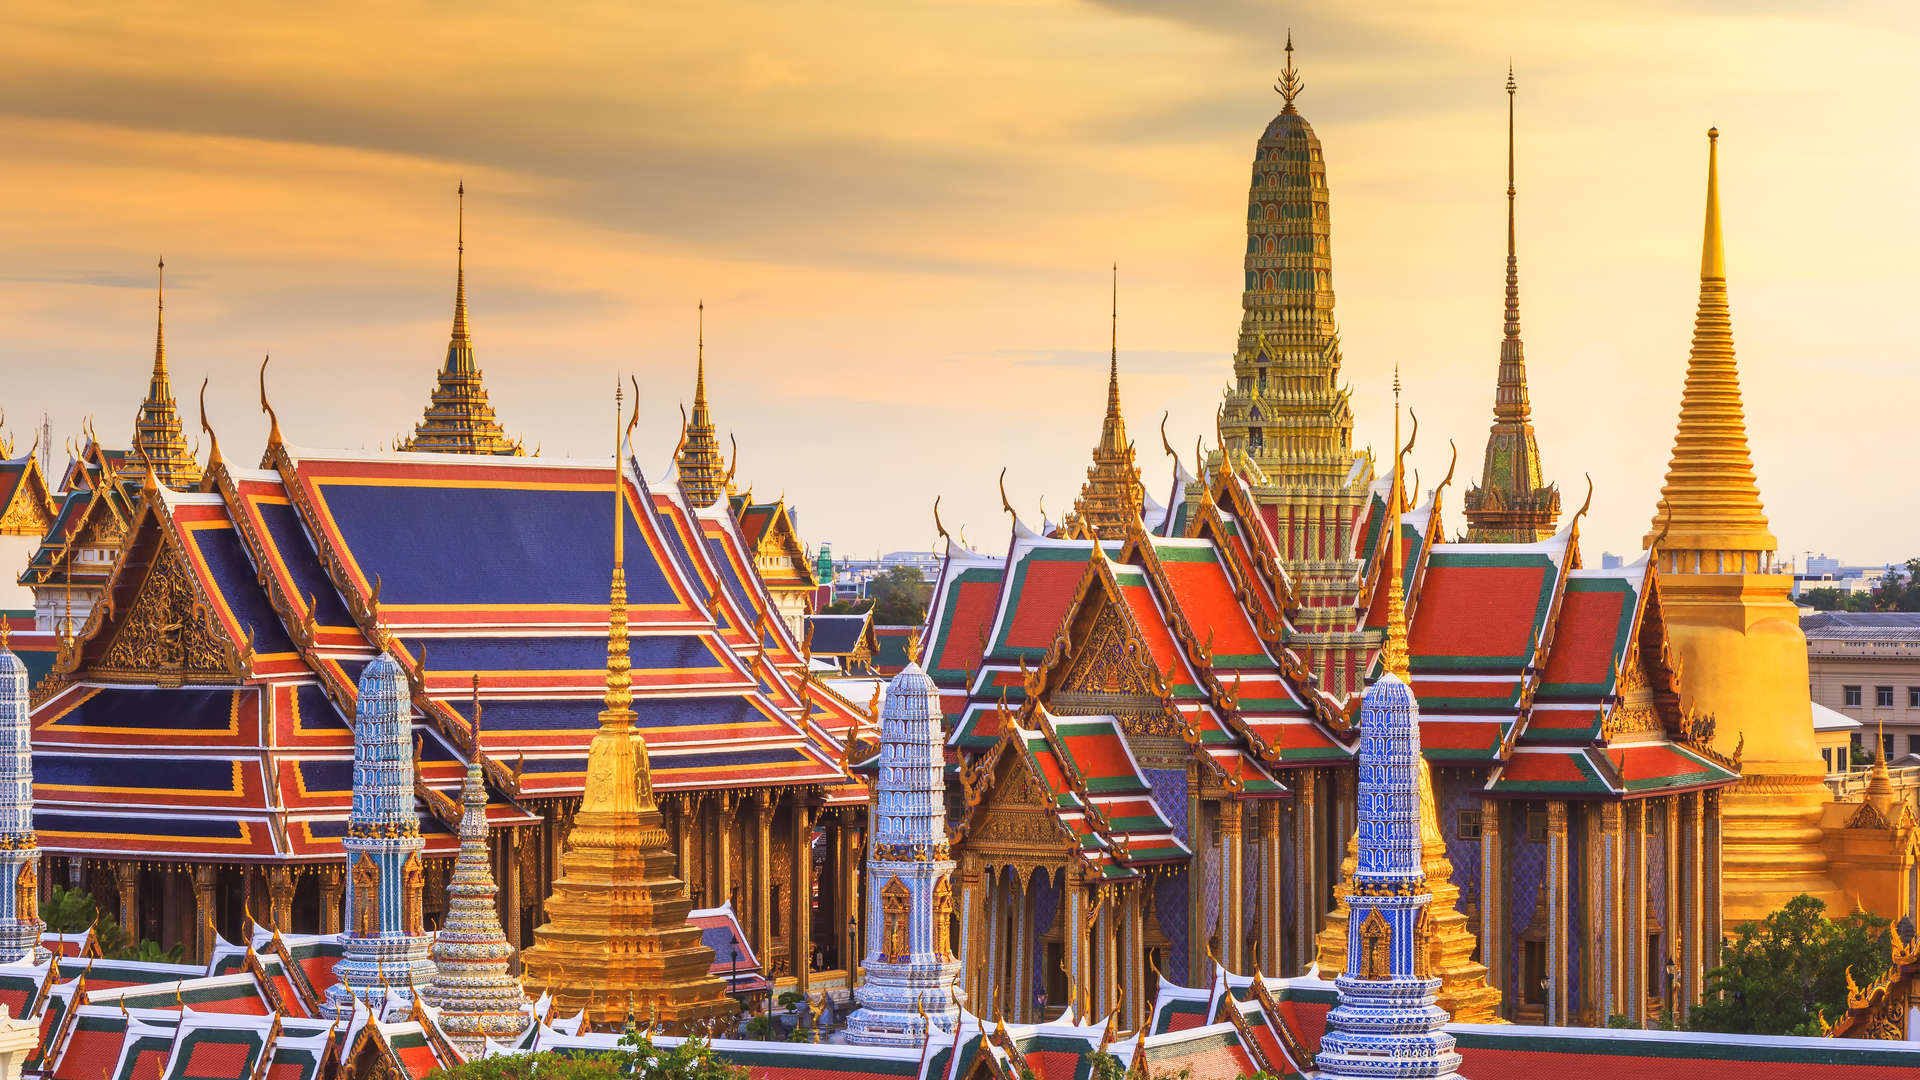 Thailiand | Bangkok | ©SOUTHERN Traveler/Shutterstock.com